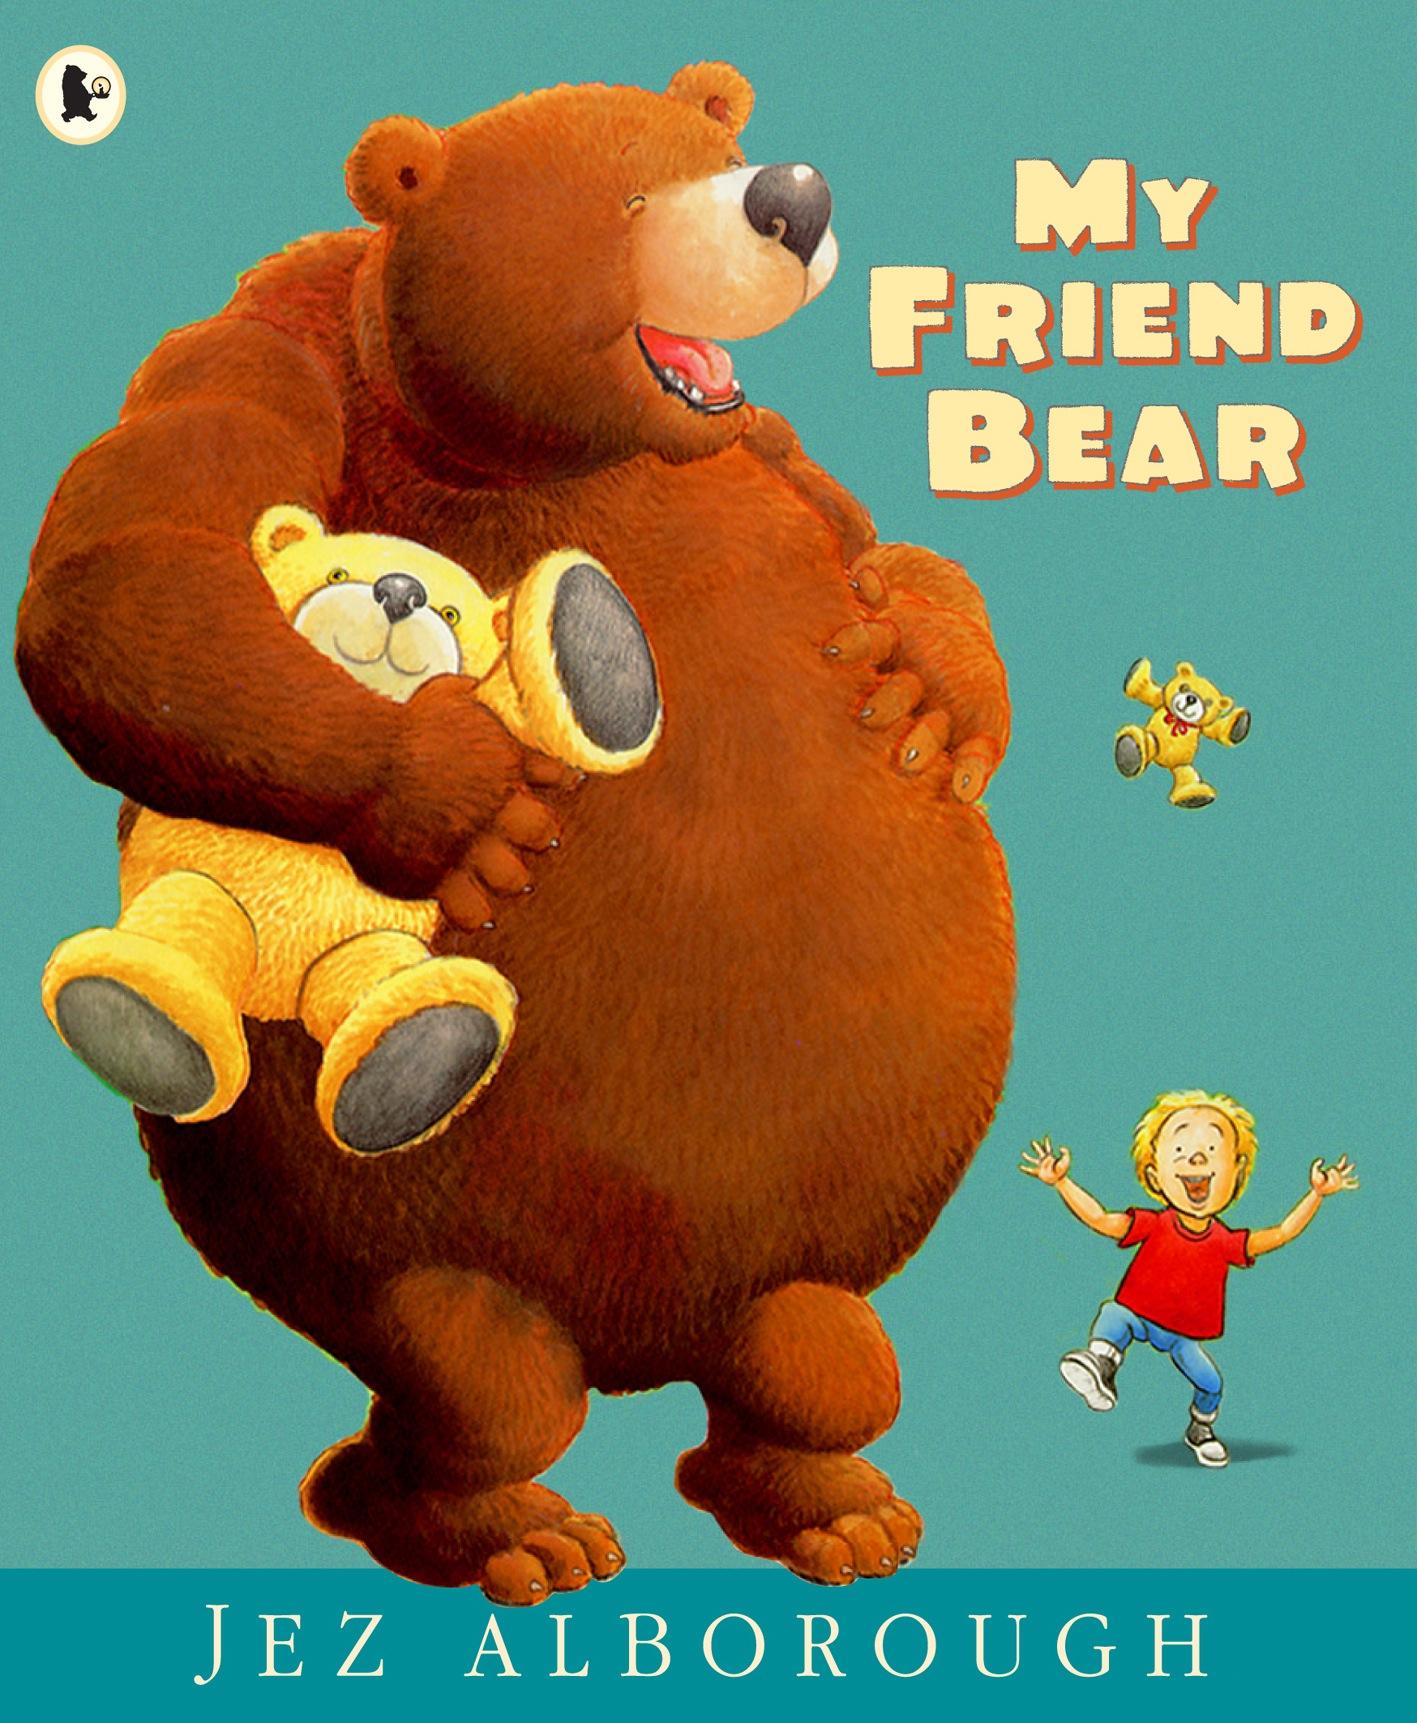 jezalborough com my friend bear